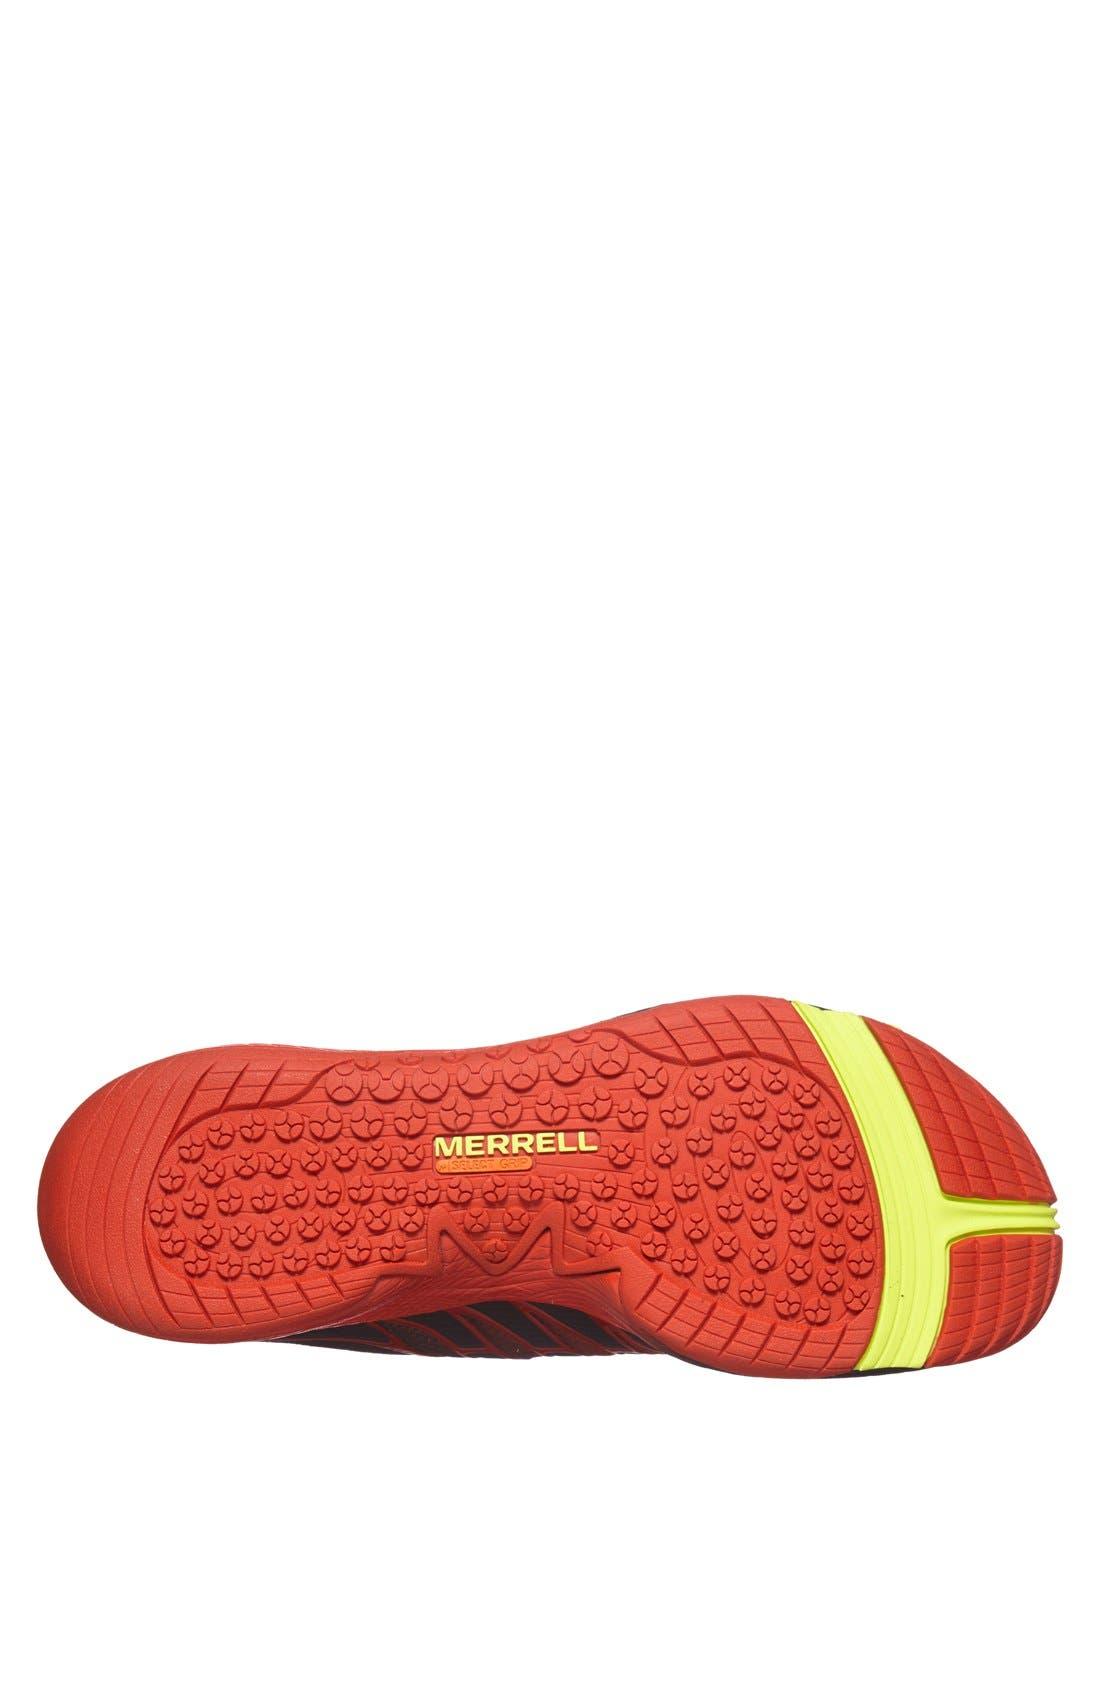 Alternate Image 3  - Merrell 'Allout Fuse' Trail Running Shoe (Men)